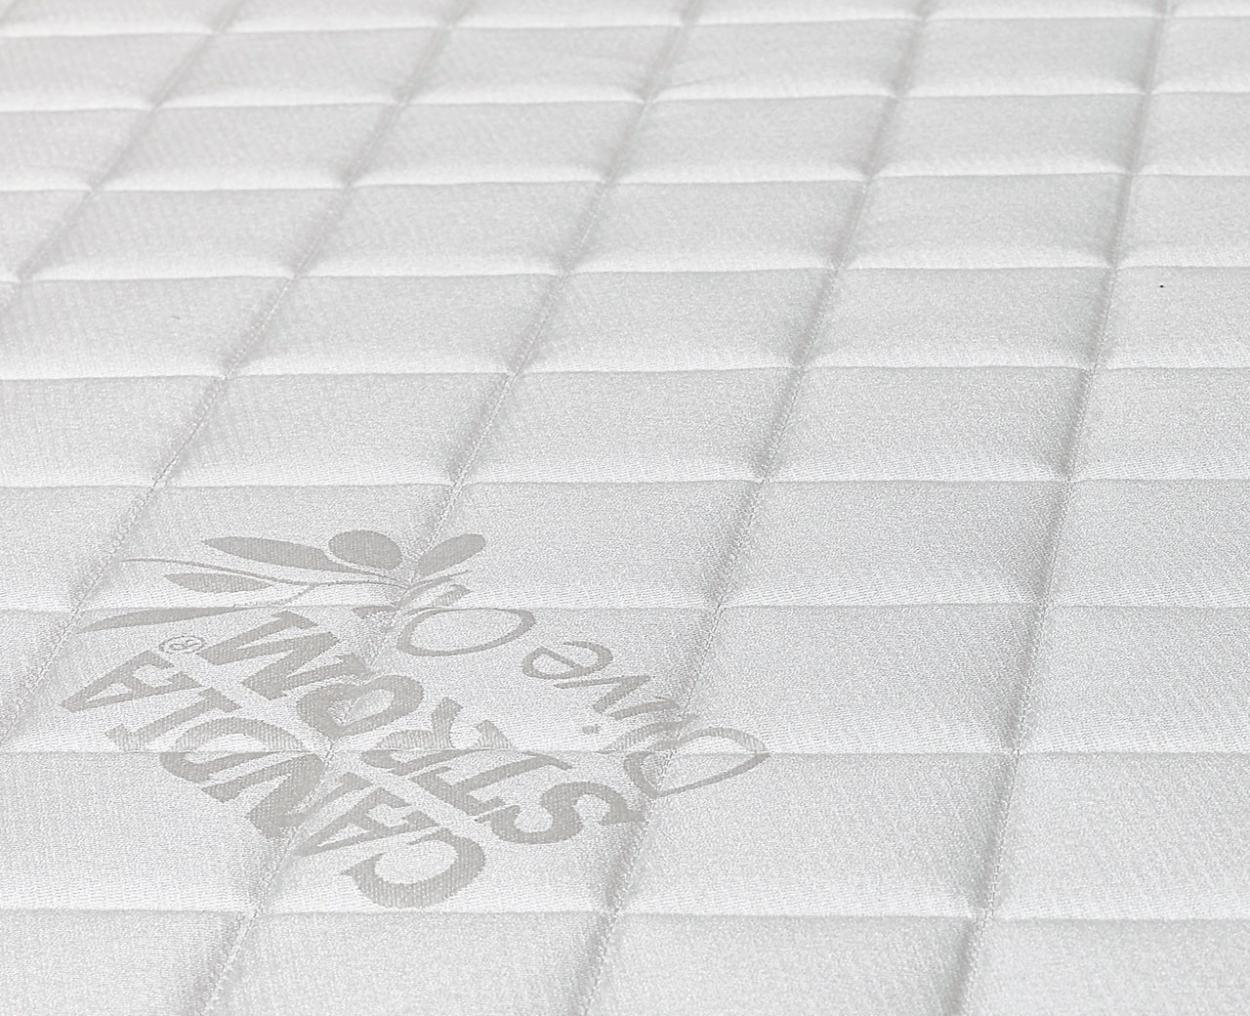 CandiaStrom - Mattress SOUTHERN ESSENCE - NATUREZZA COLLECTION -  Details